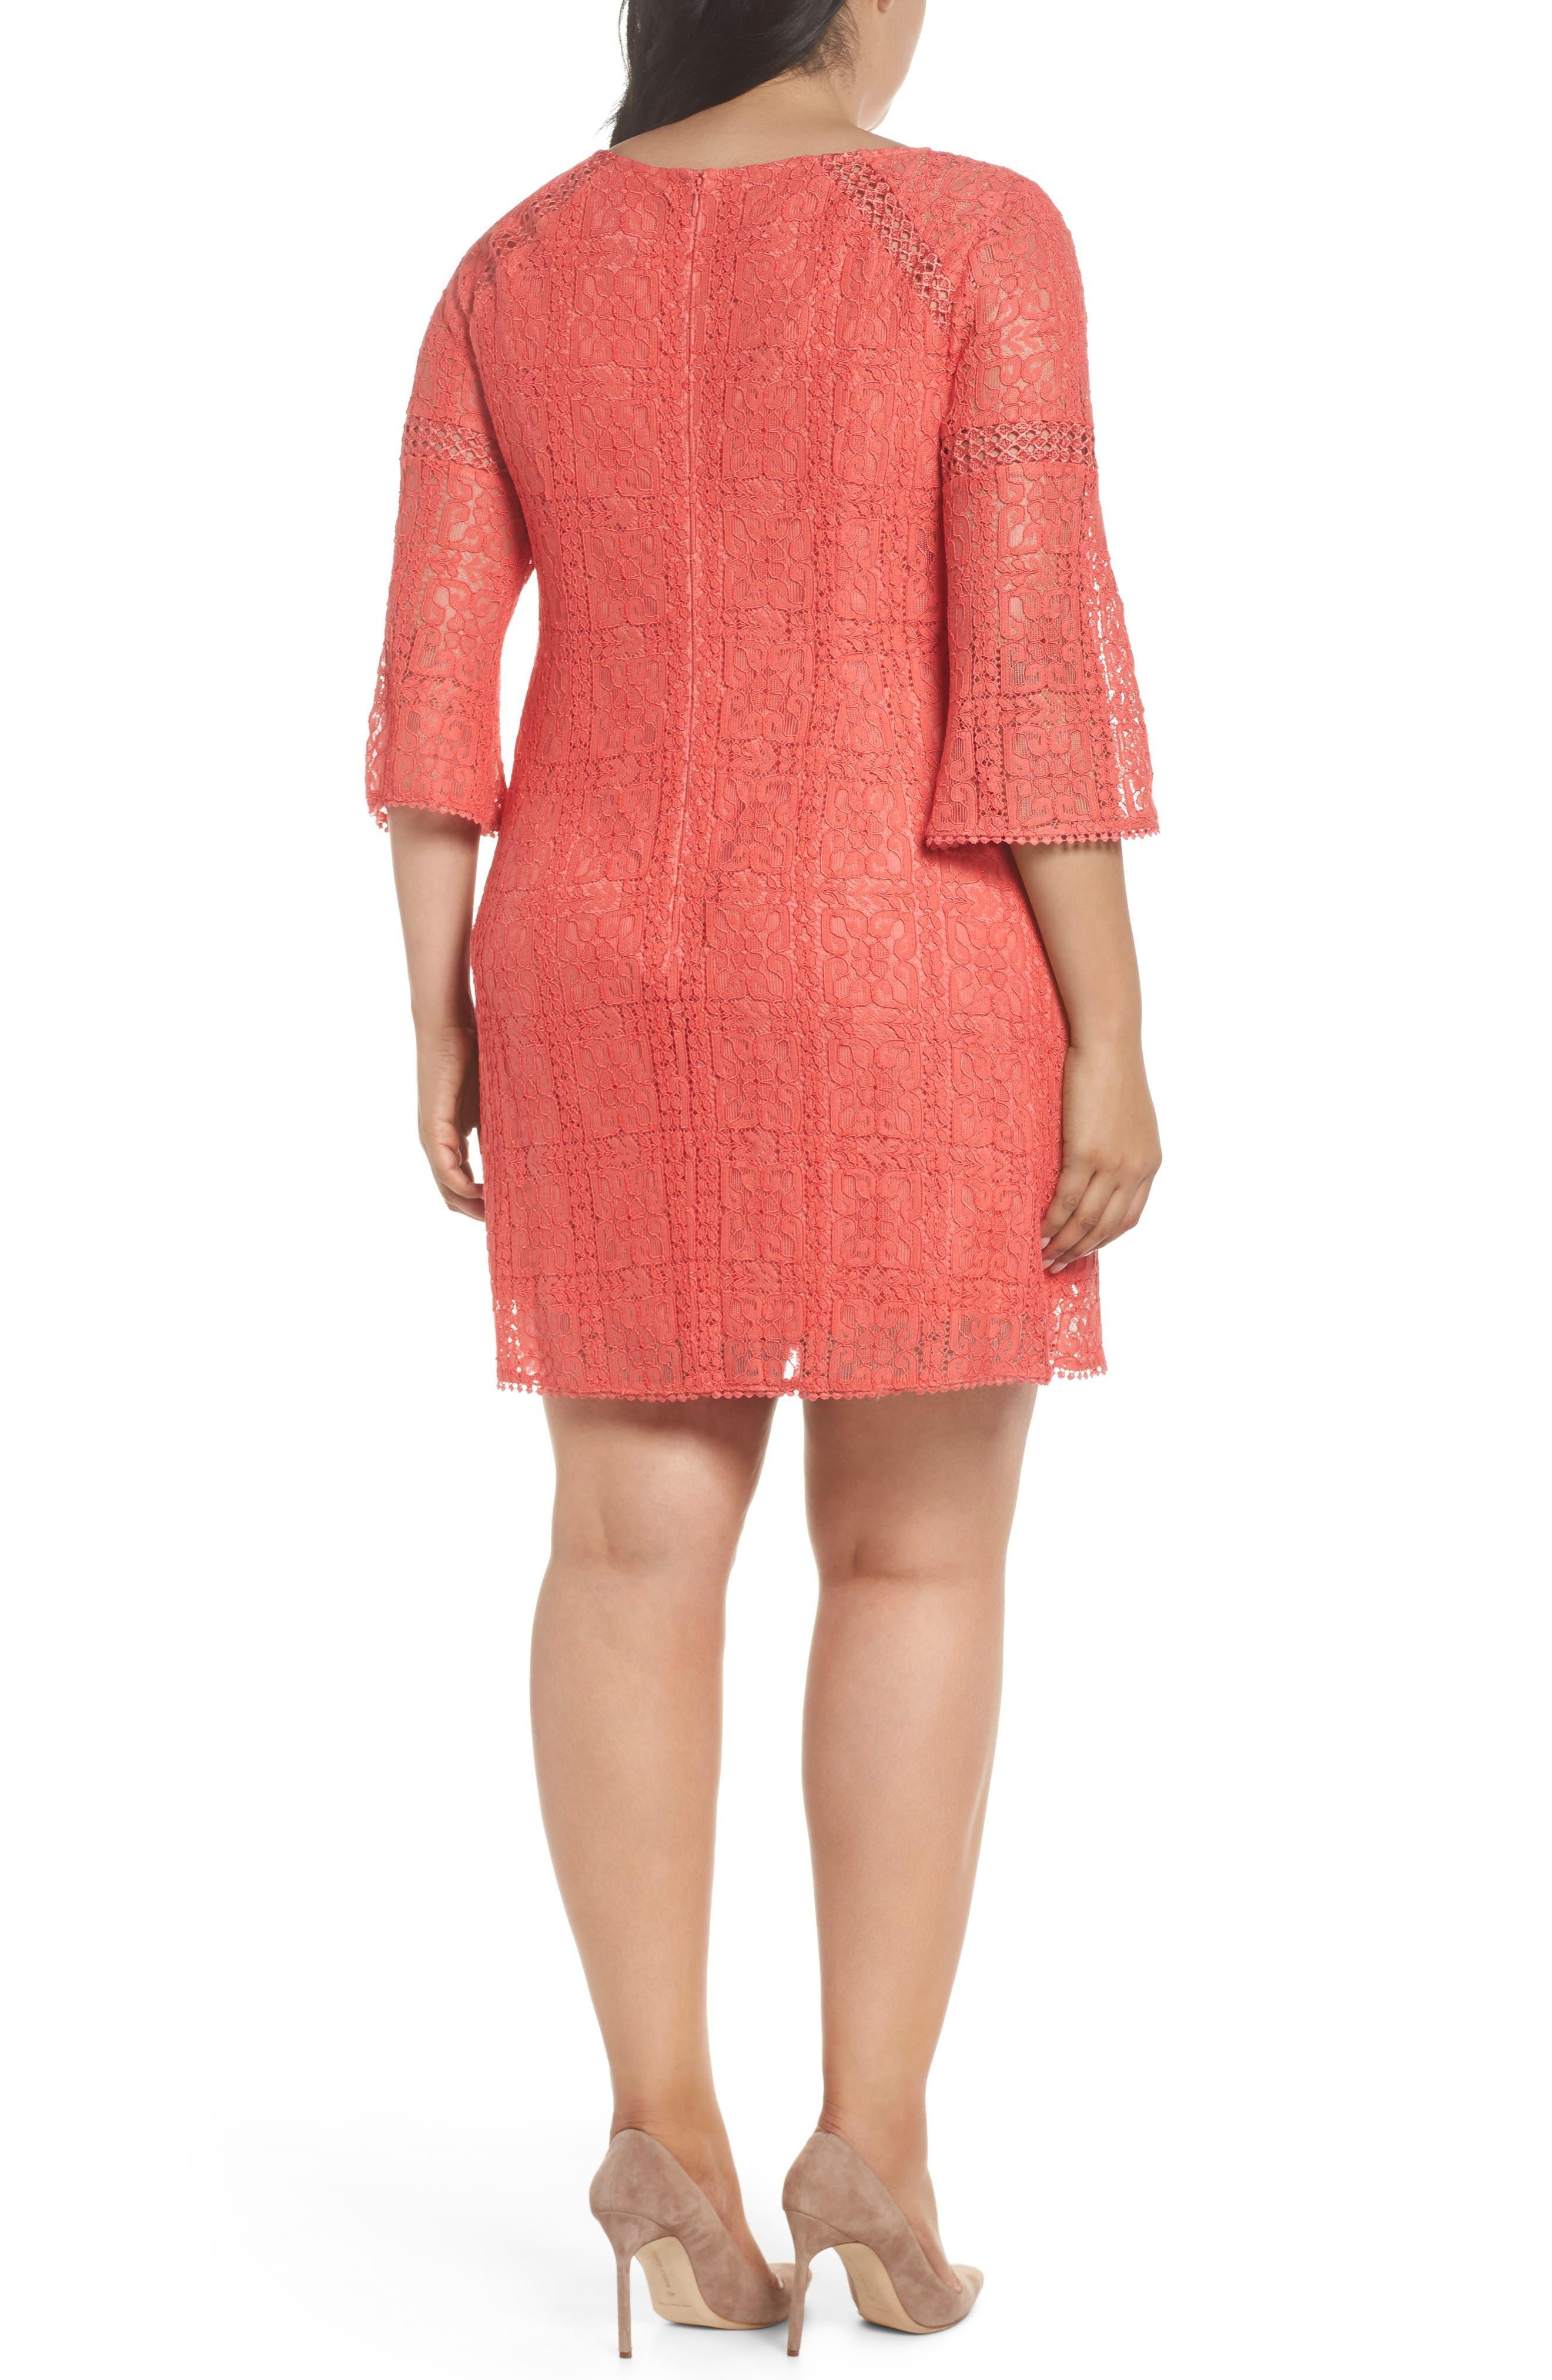 Marni Lace Shift Dress,                             Alternate thumbnail 2, color,                             Cruise Coral